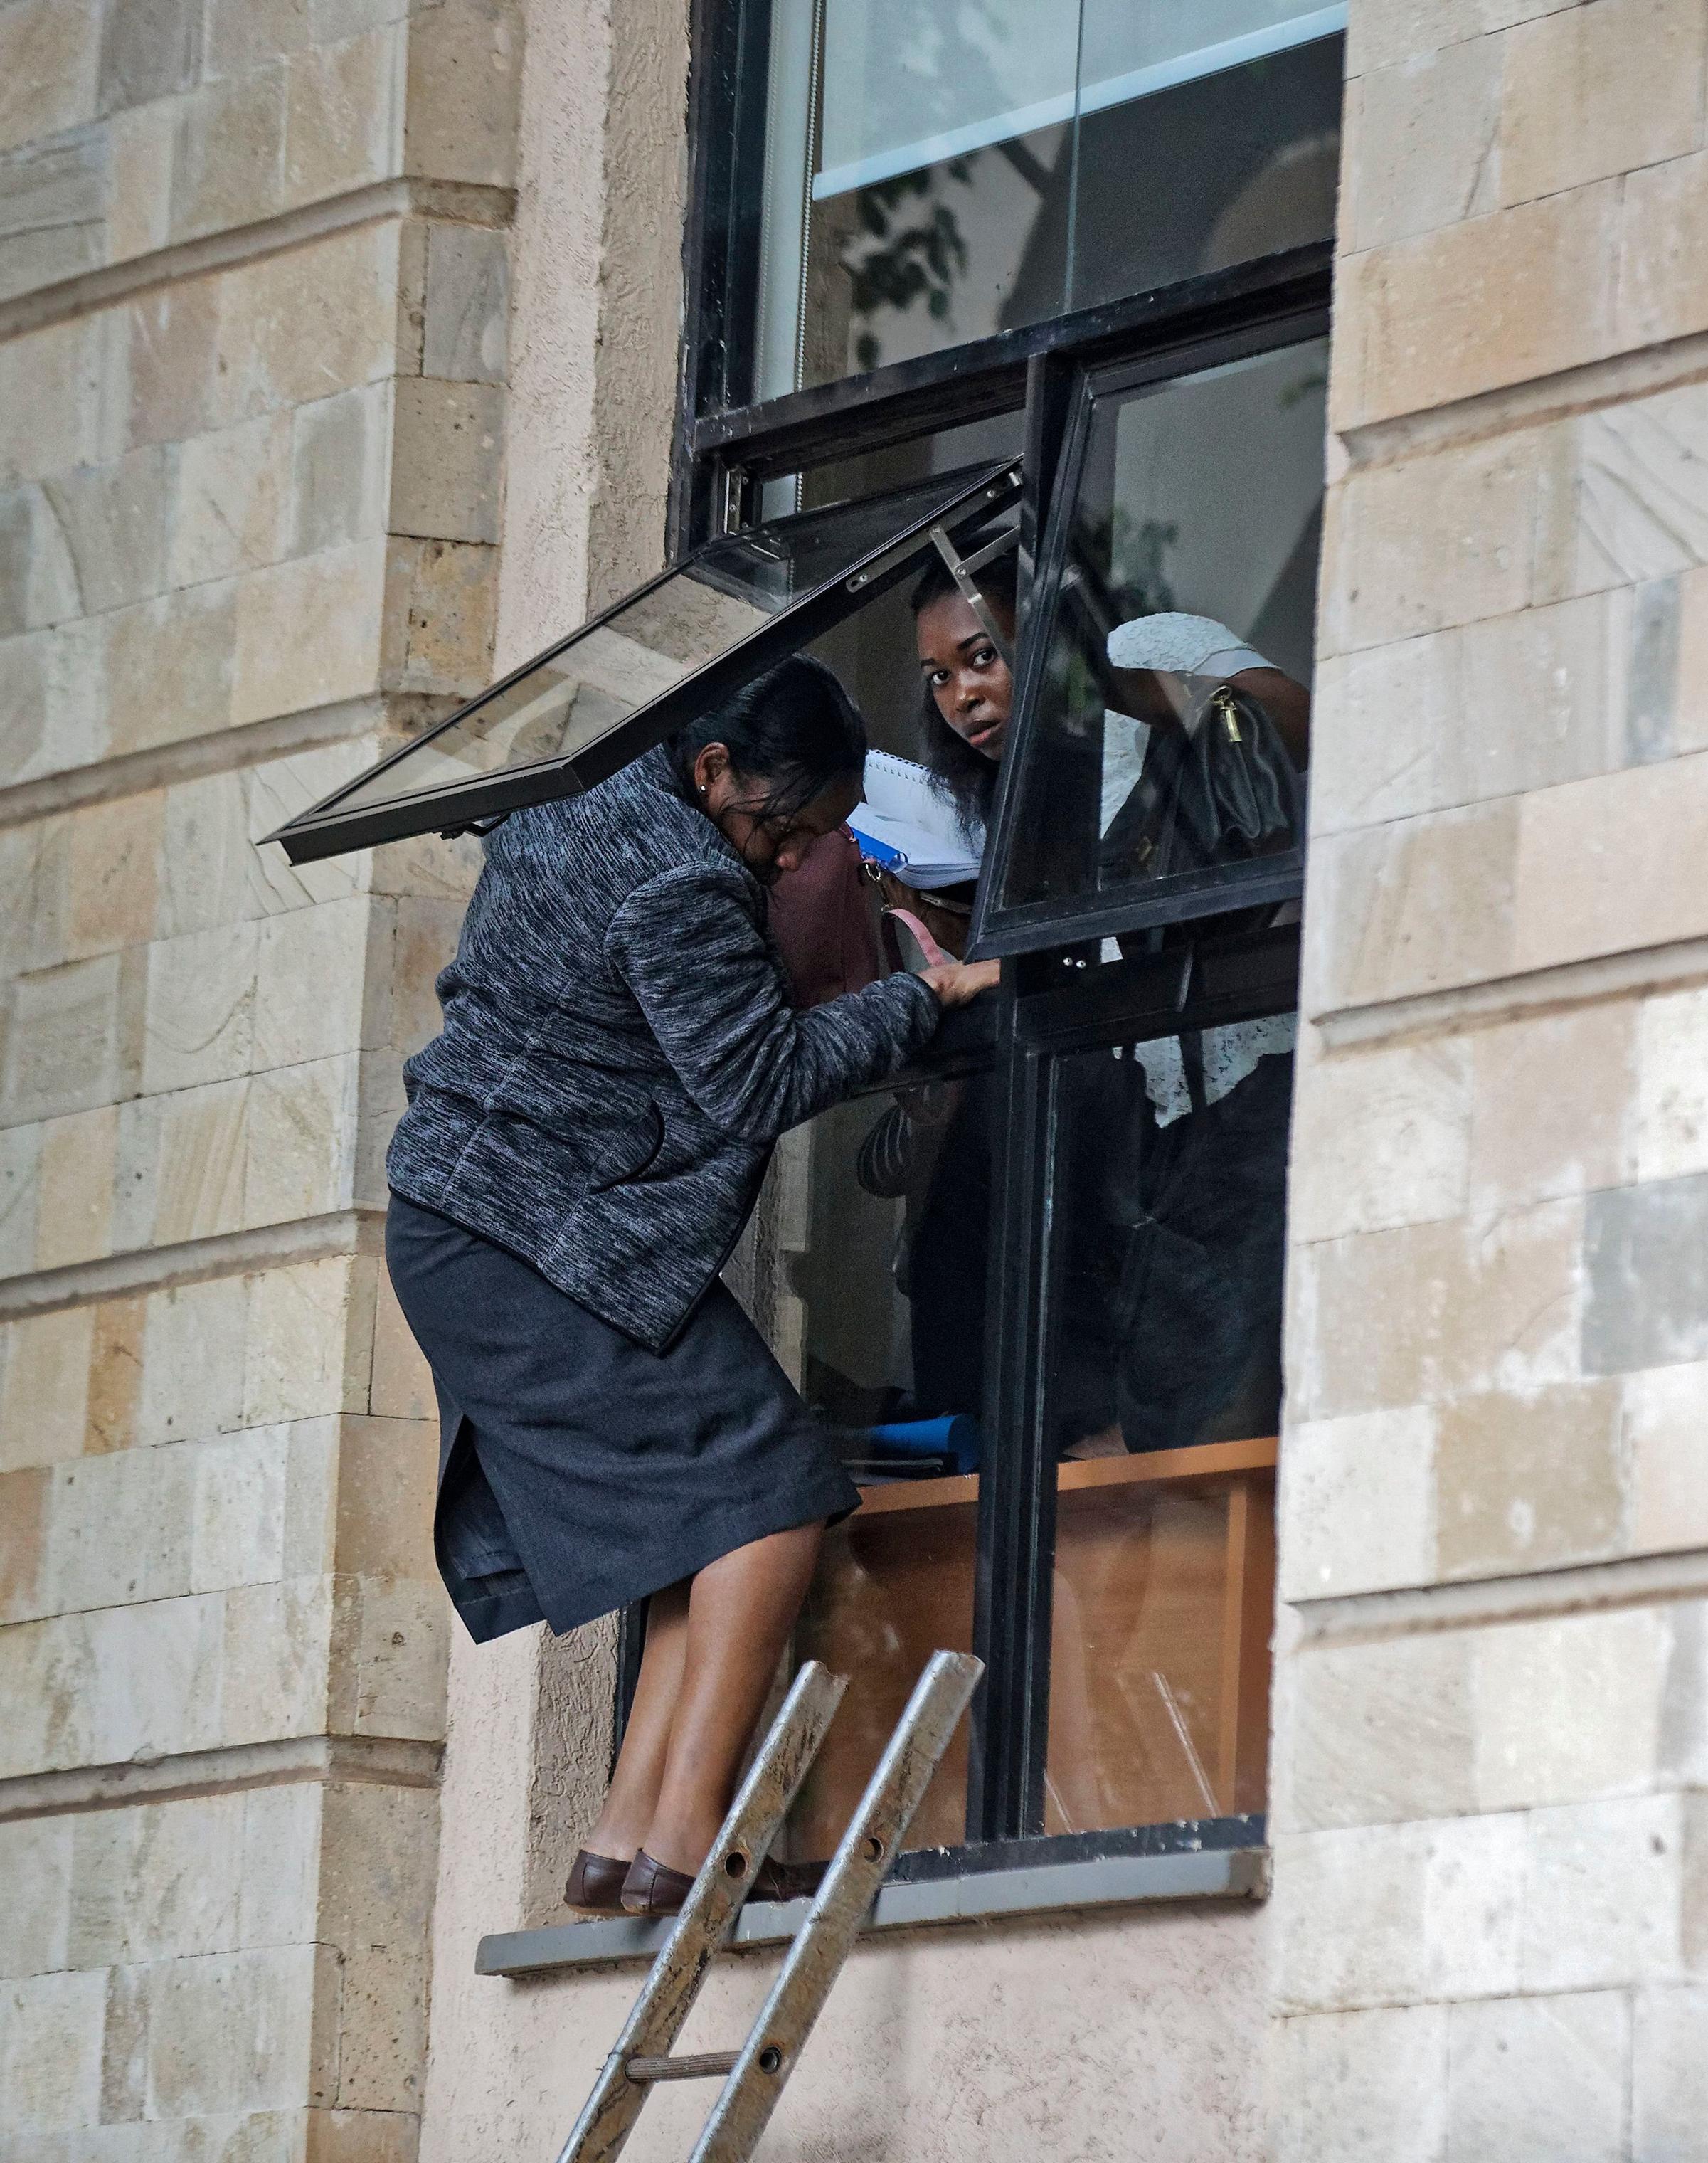 Civilians flee through a window at a hotel complex.